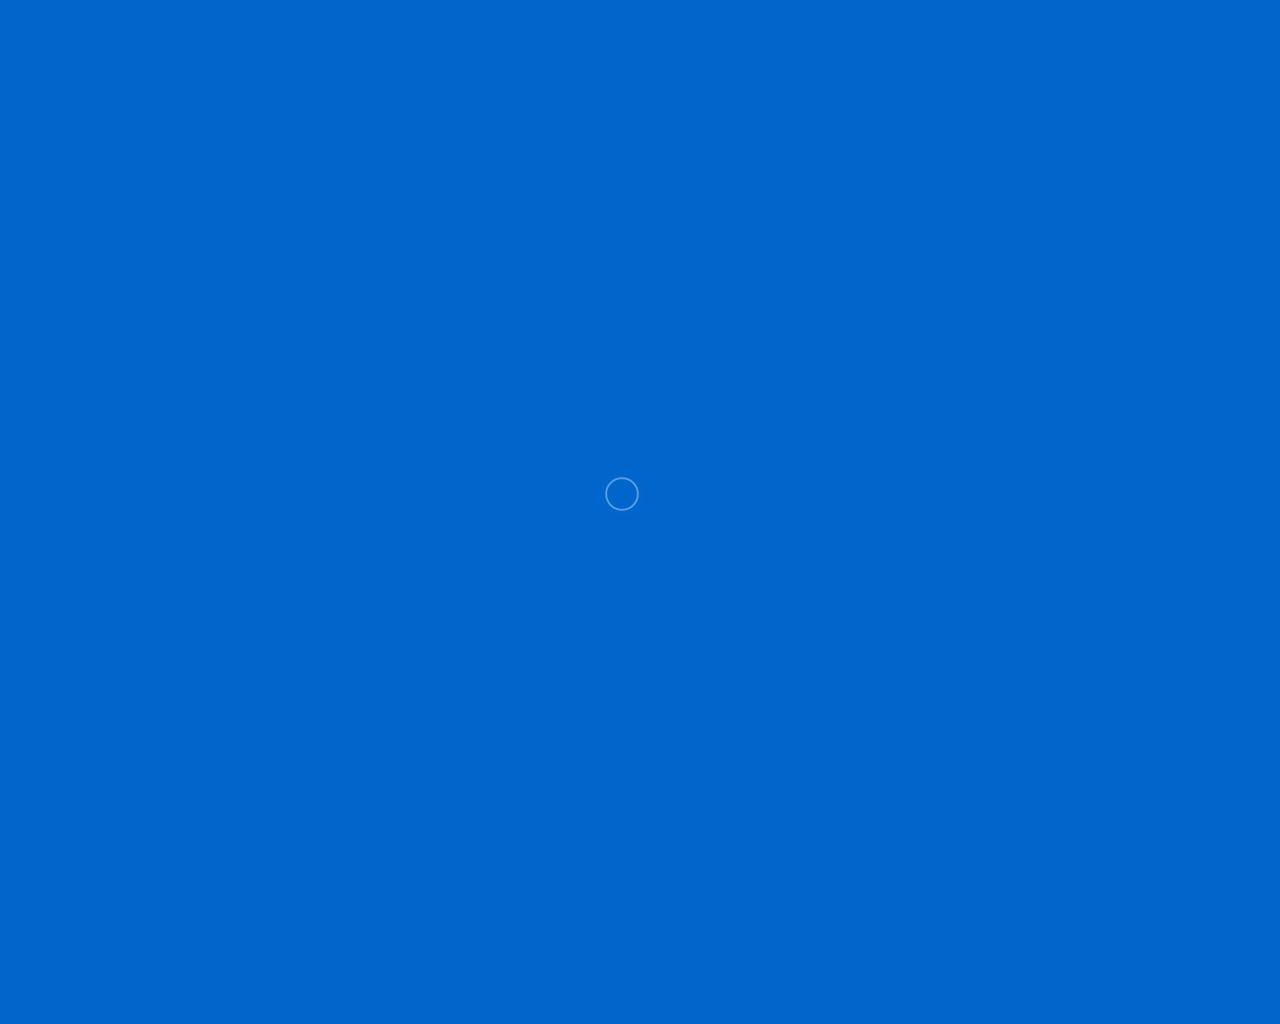 Foyle College Website